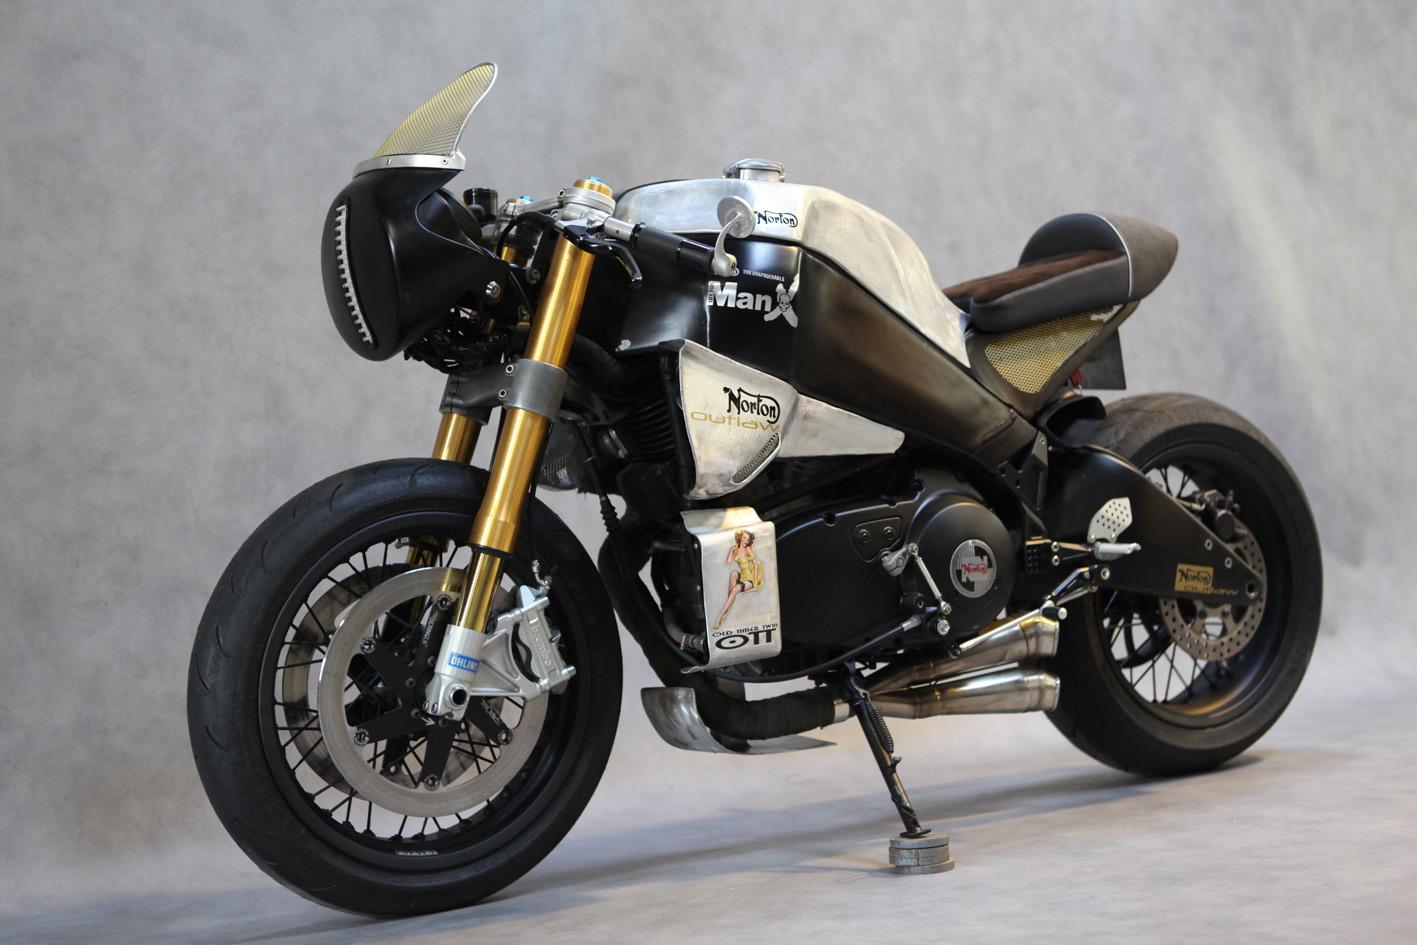 Return of the Cafe Racers - Buell Norton Manx Neoretro